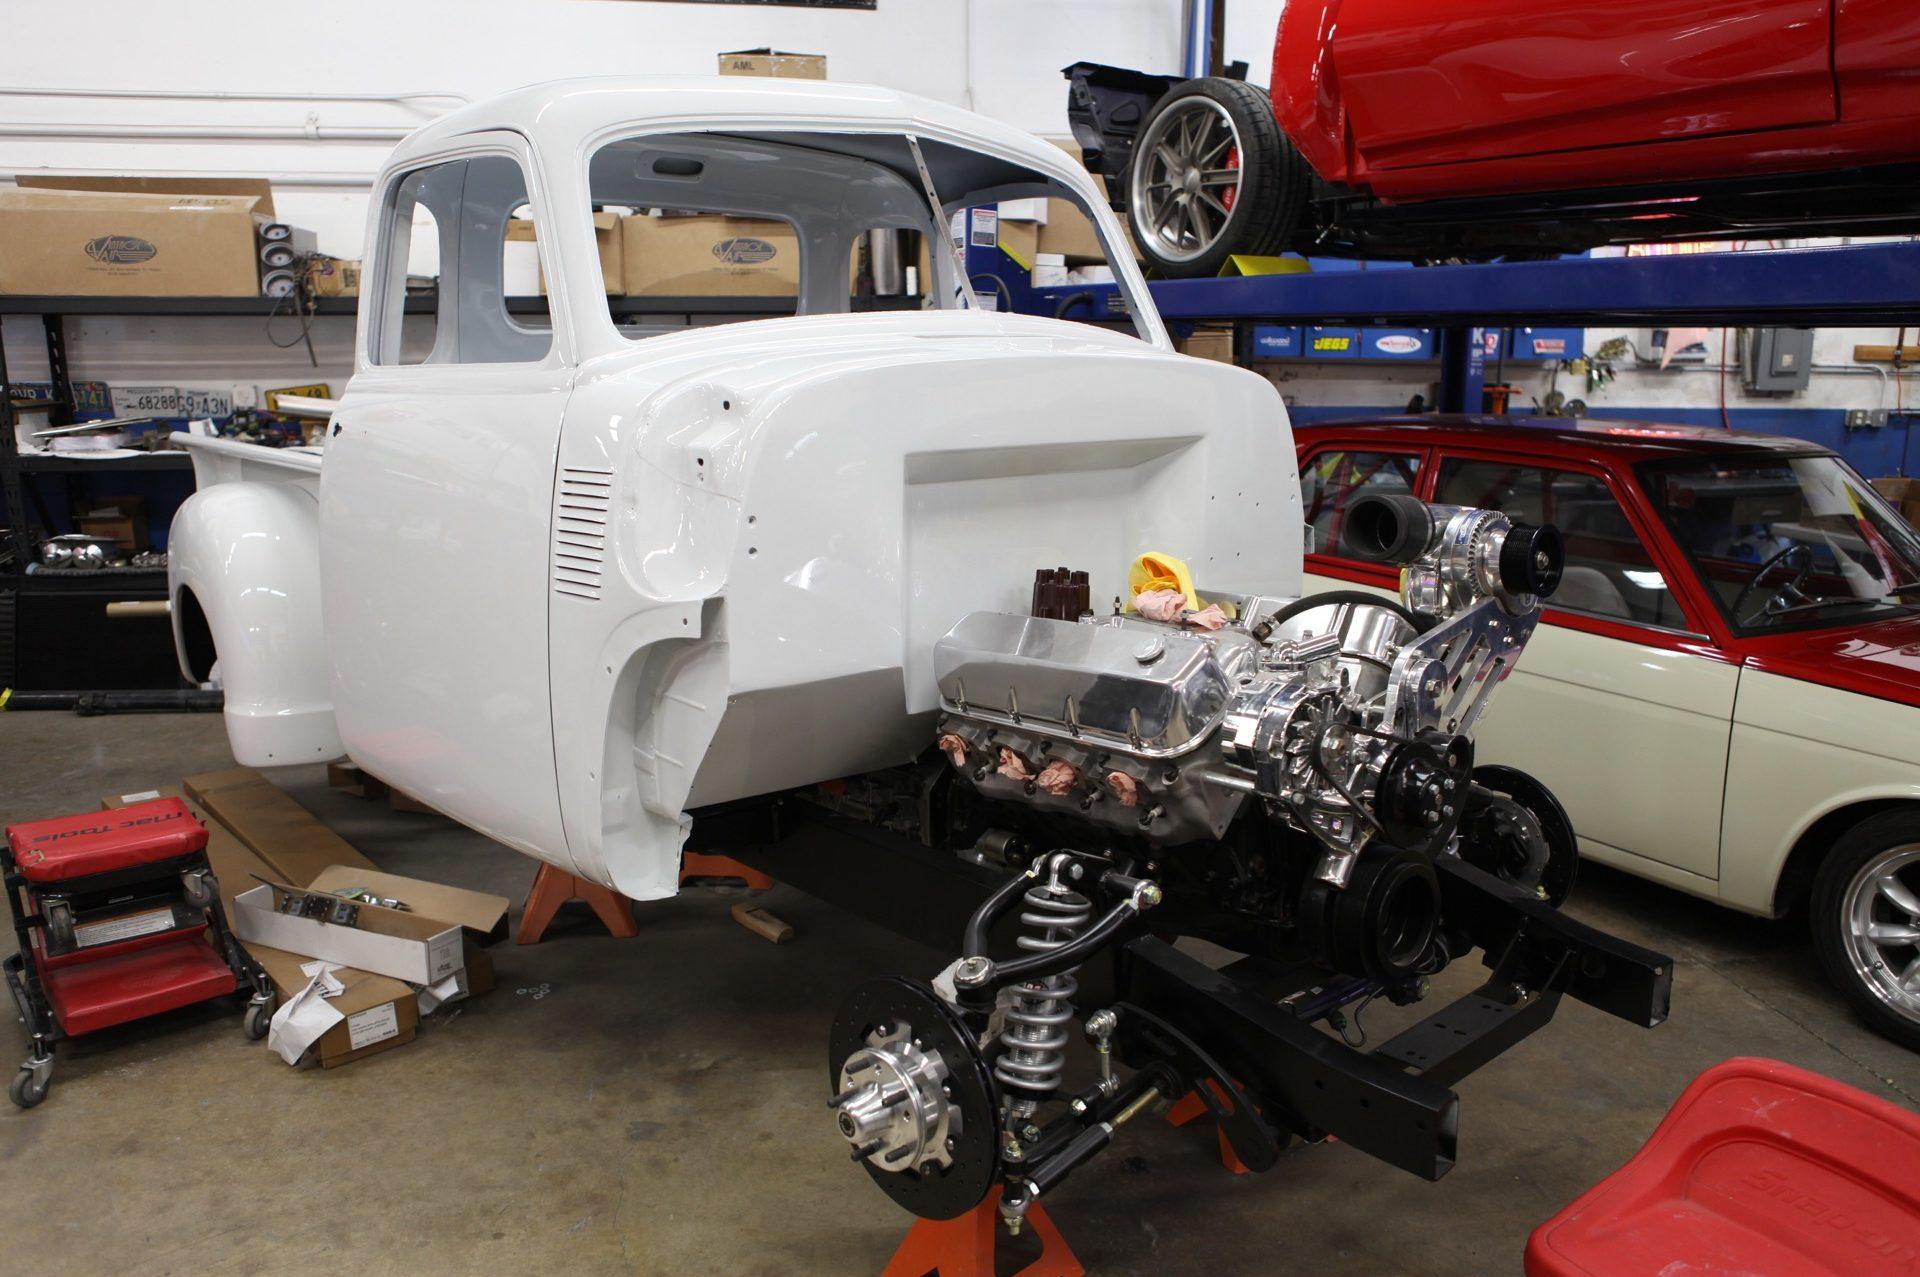 1951 Chevy Truck Metalworks Classics Auto Restoration Speed Shop Metalworks Classic Auto Restoration Speed Shop